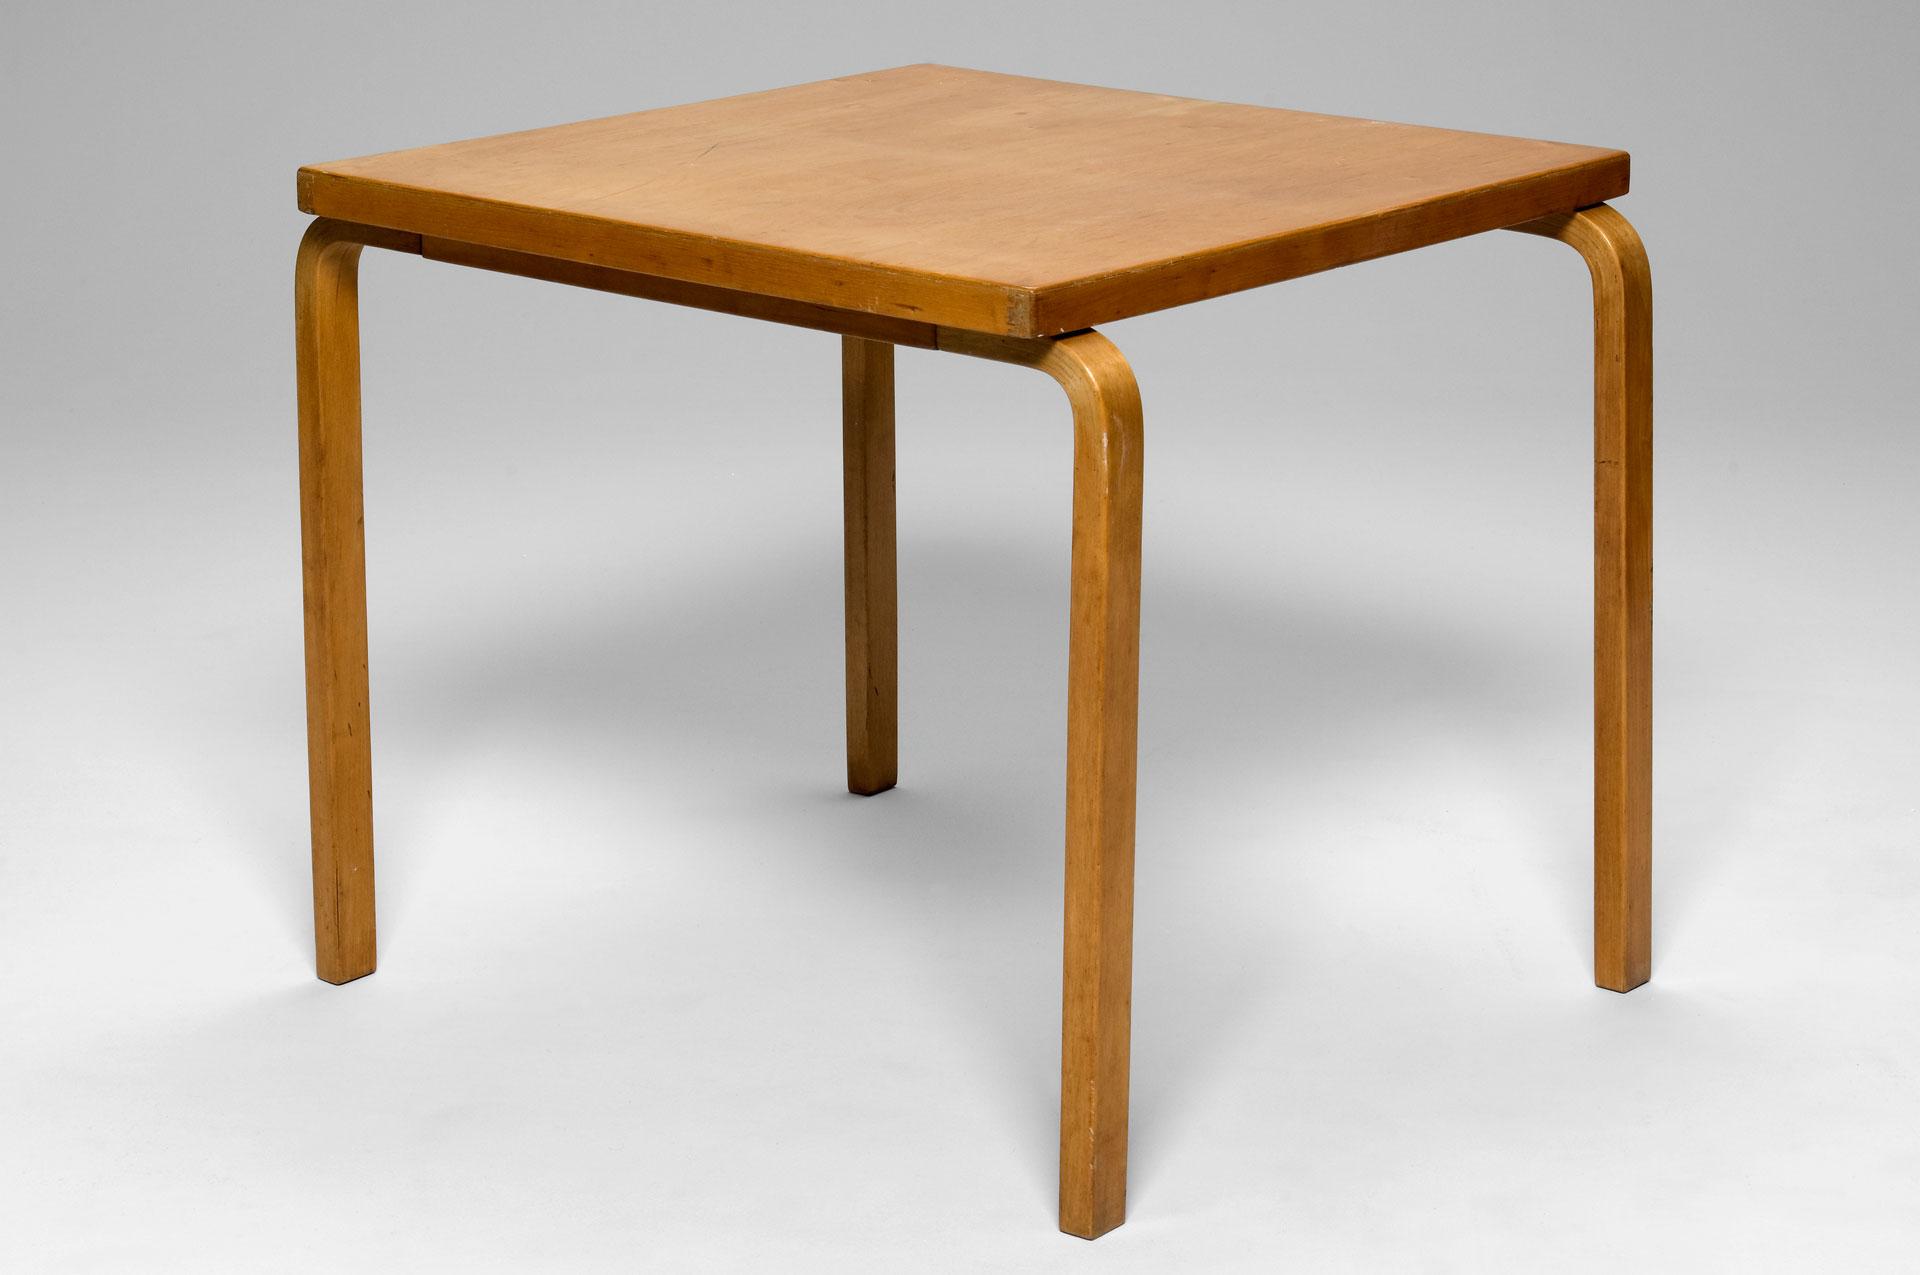 jacksons table no 88 alvar aalto. Black Bedroom Furniture Sets. Home Design Ideas